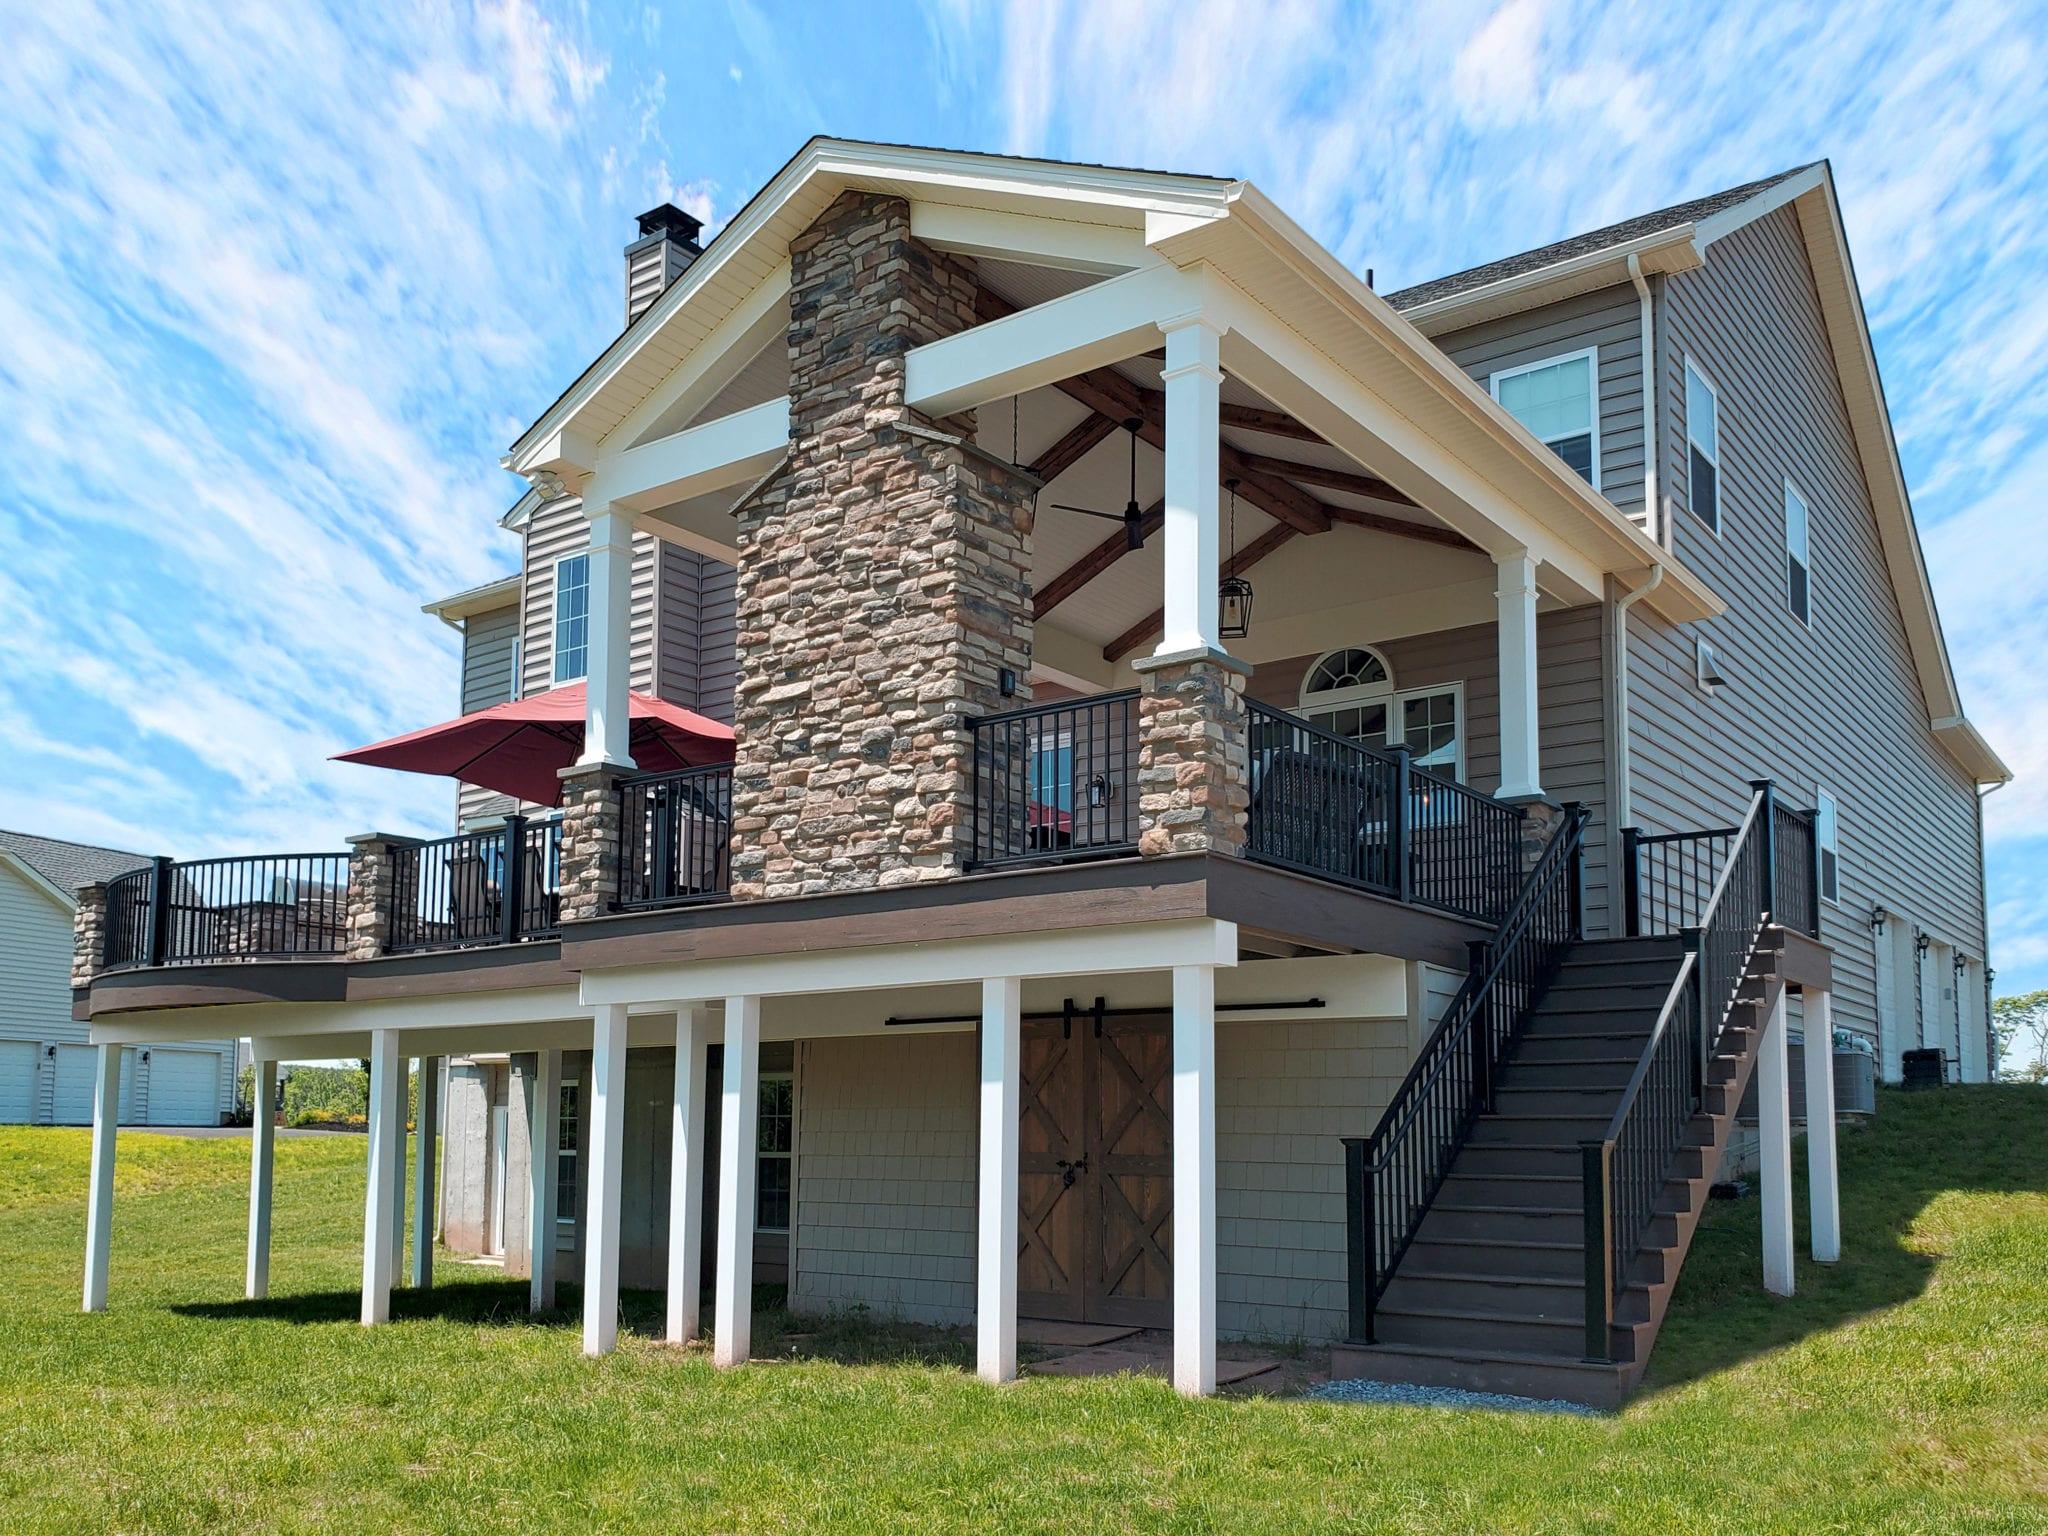 Barnwood Porch / Mocha TimberTech Deck - Furlong, PA 1